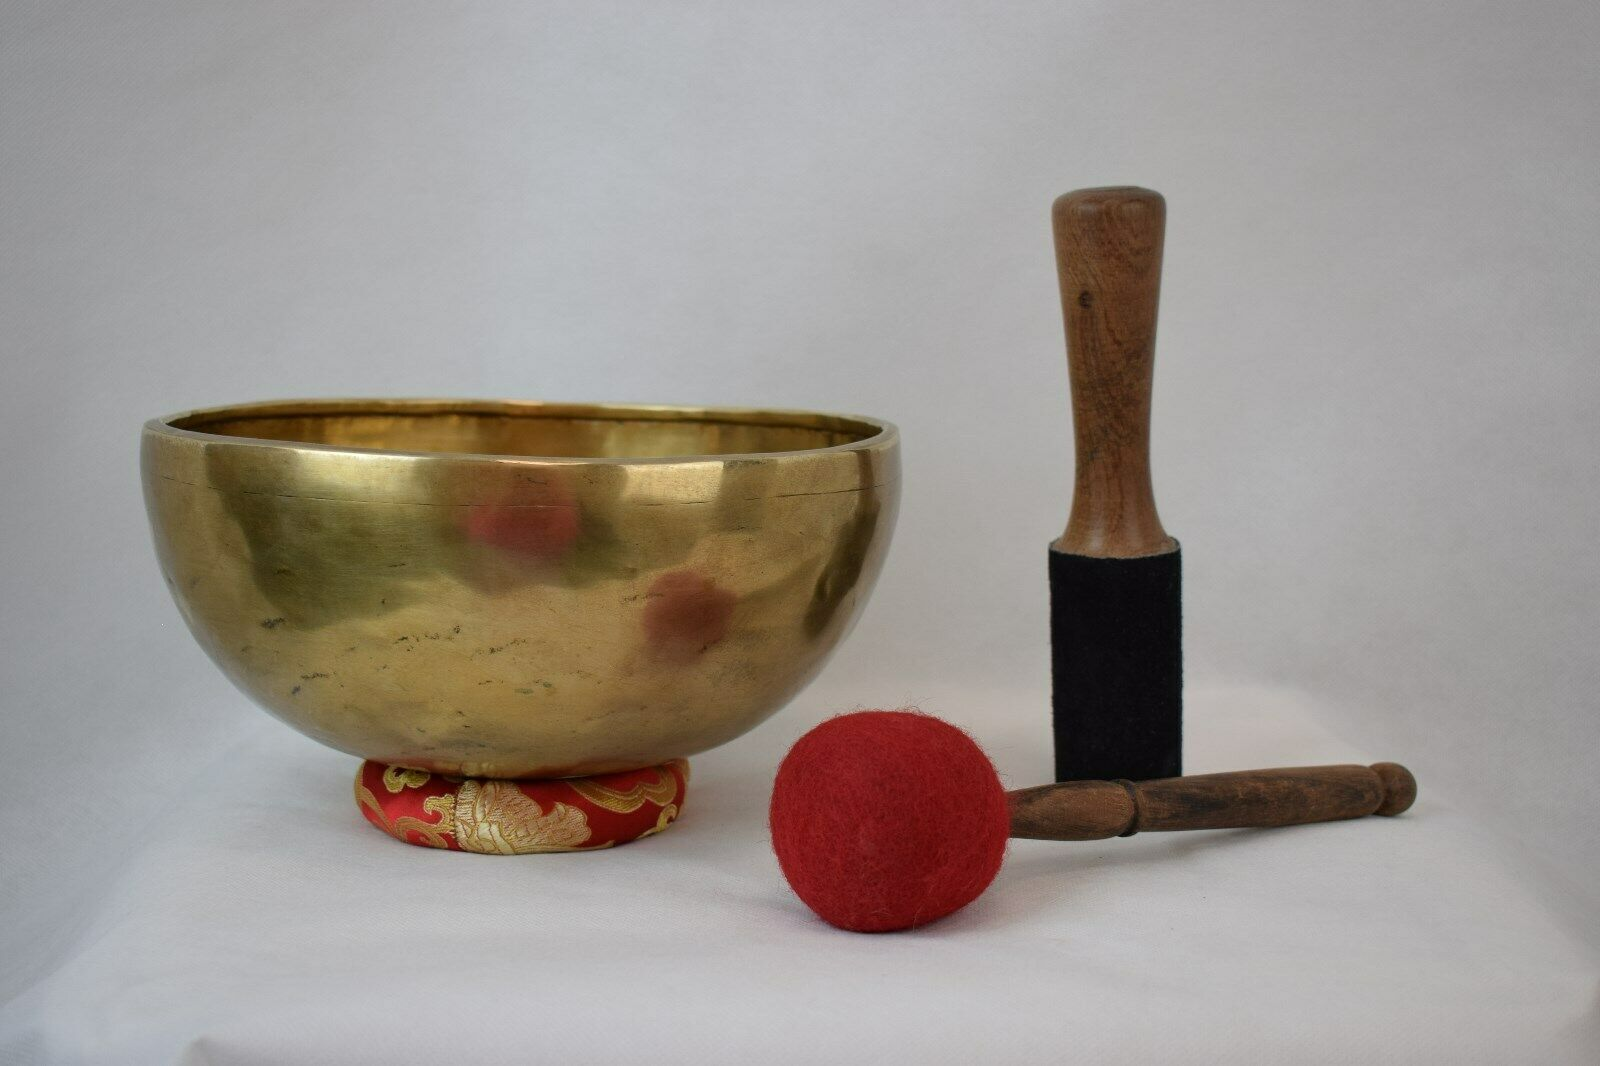 Campana tibetana-7 metalli-forgiata a mano-originale Nepal -Shiva Lingam